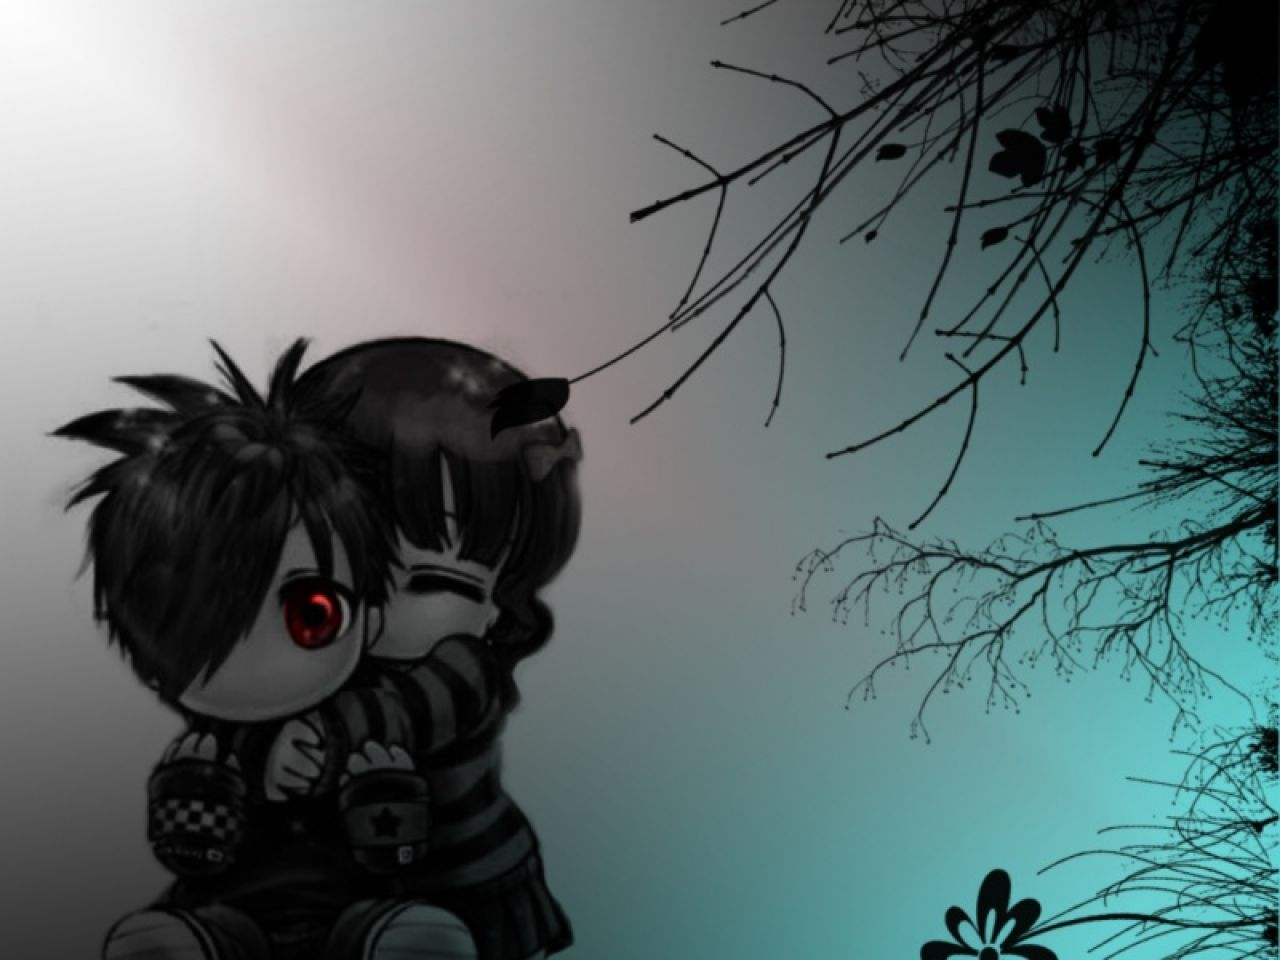 Sad Love Anime 32 Wallpaper   Hdlovewallcom 1280x960